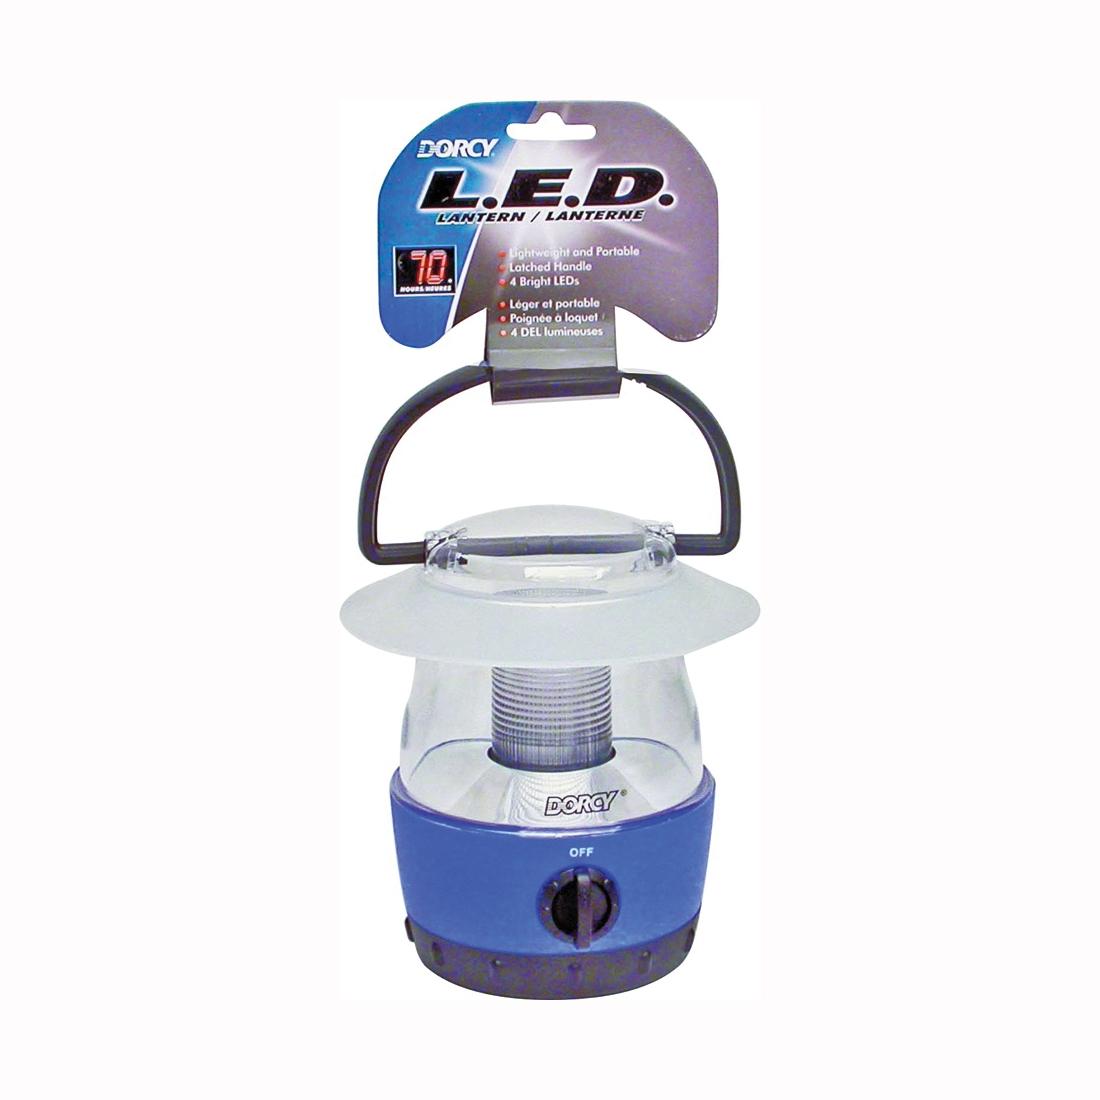 Picture of Dorcy 411017 Handheld Lantern, LED Lamp, 40 Lumens Lumens, Blue/Purple/Red/Yellow